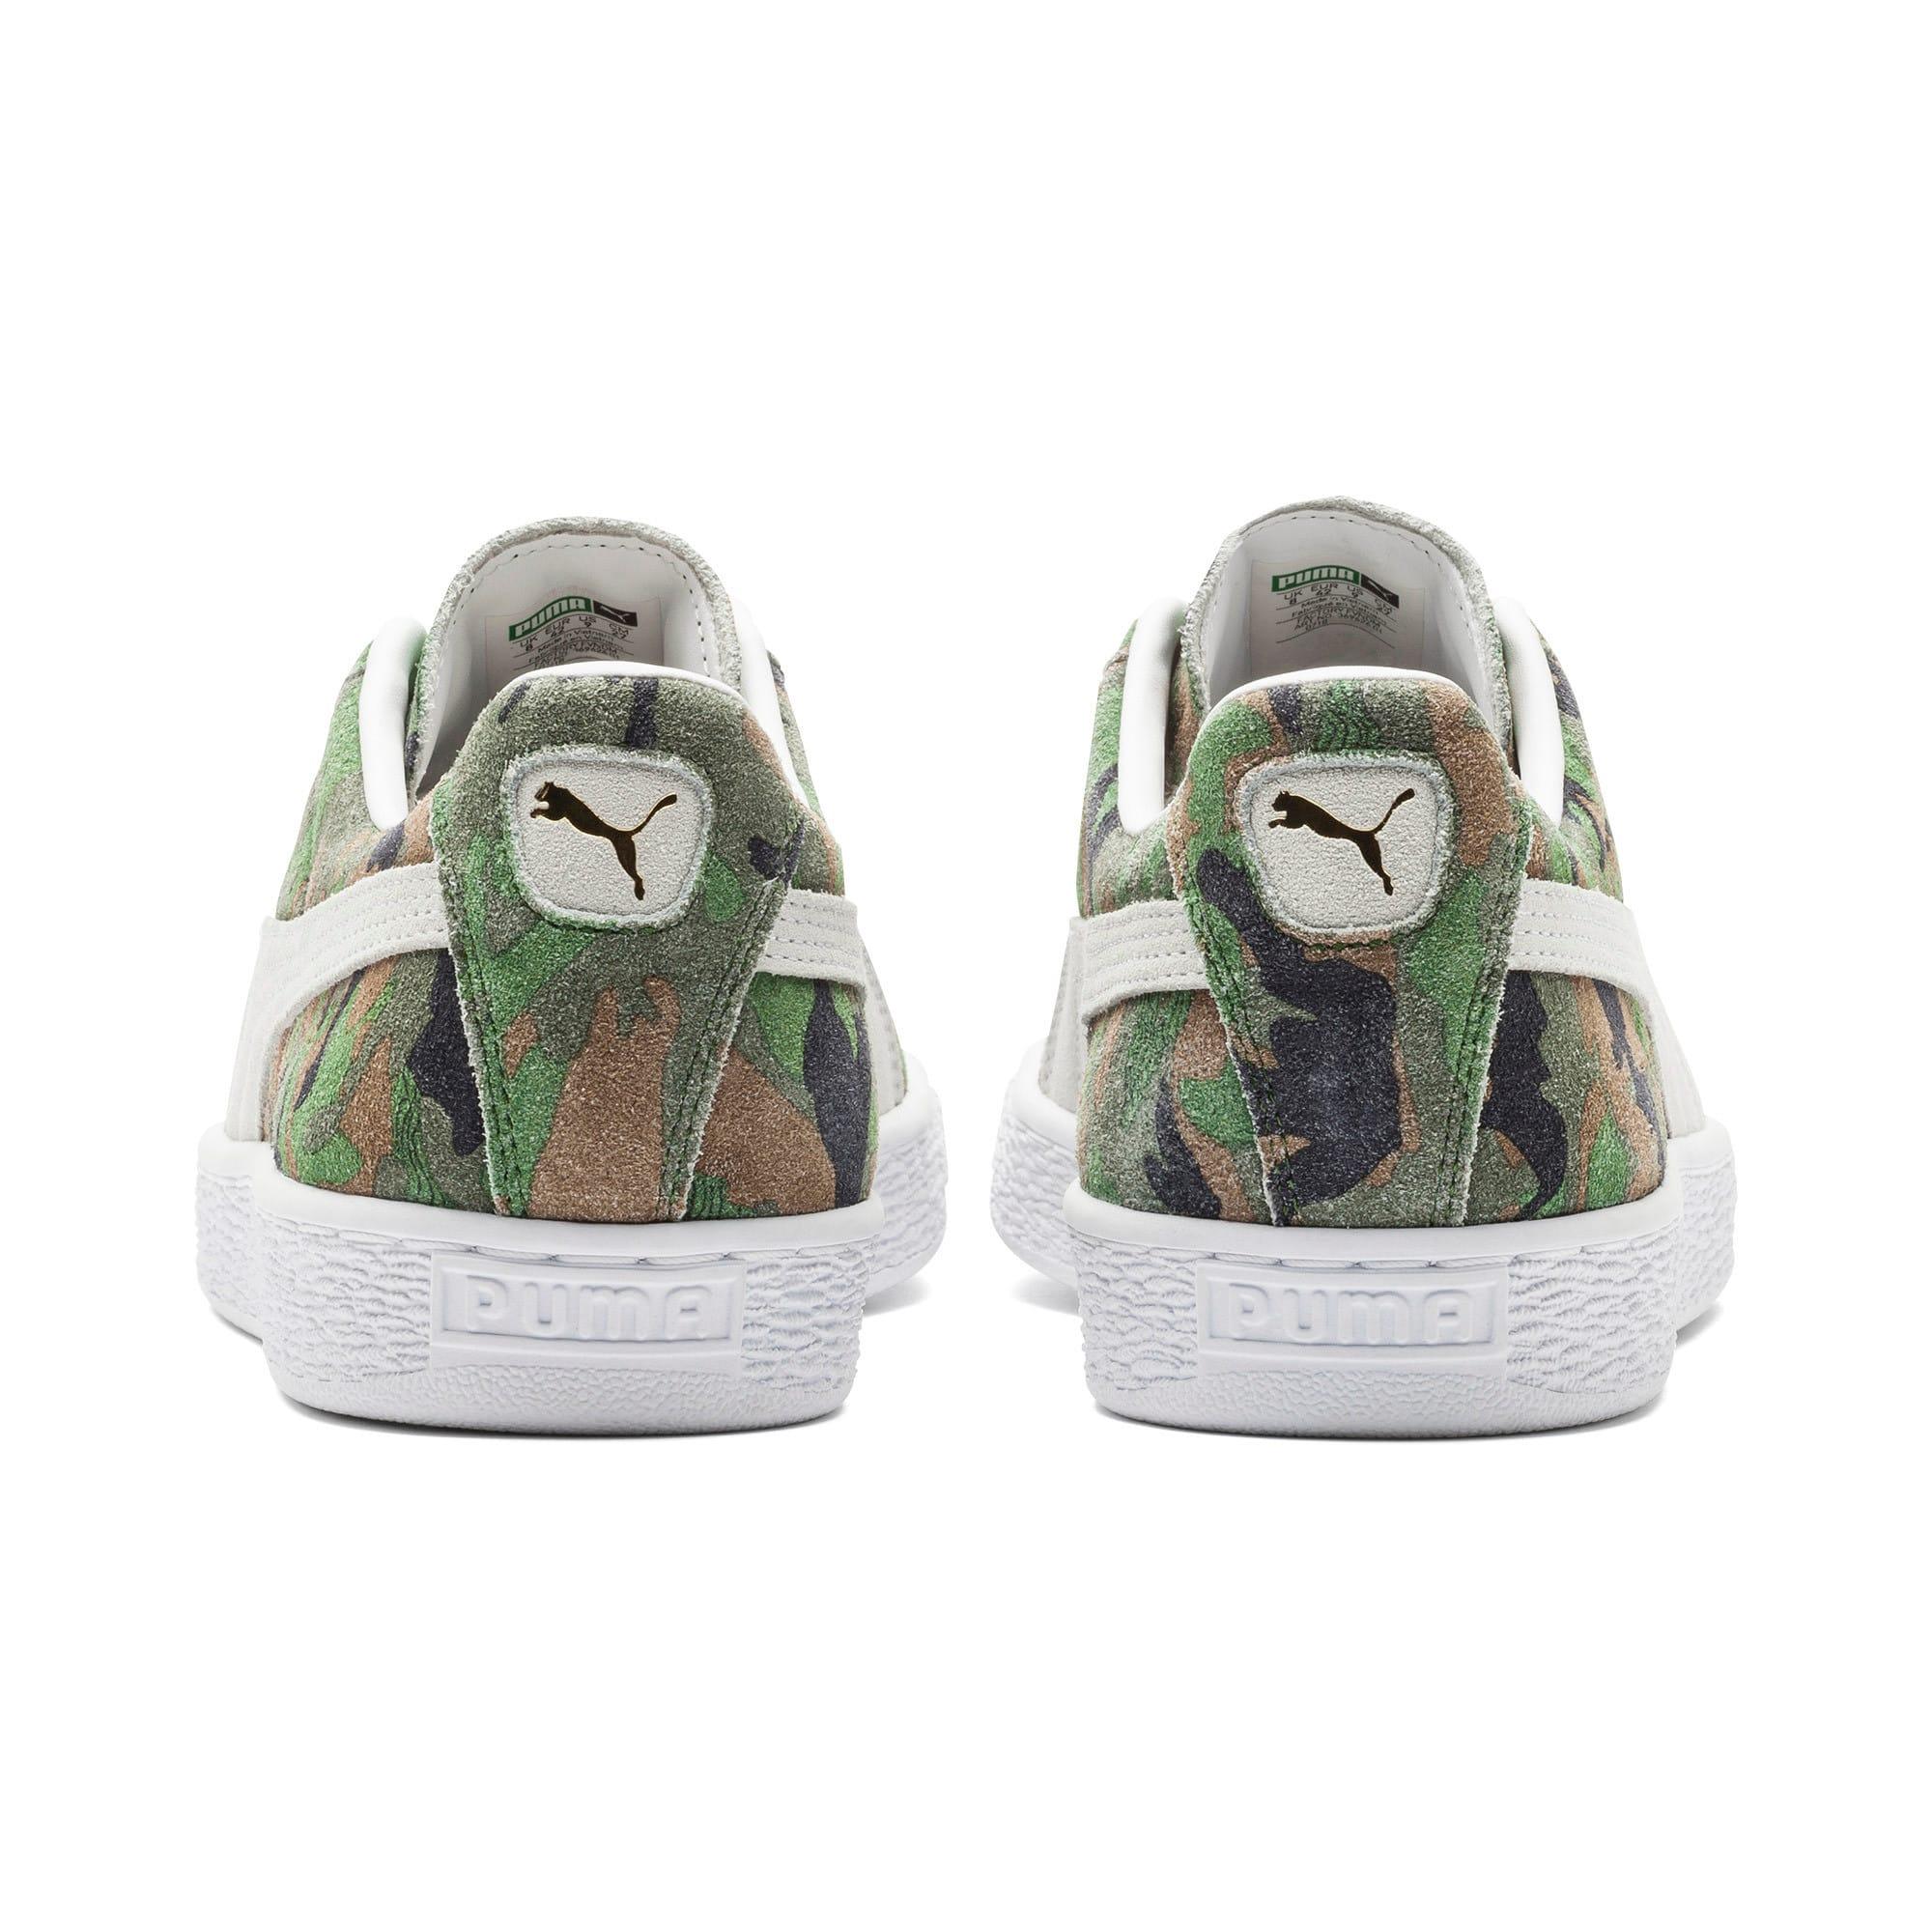 Thumbnail 3 of Suede Classic Ambush Sneakers, Dachsund-Green-Black-White, medium